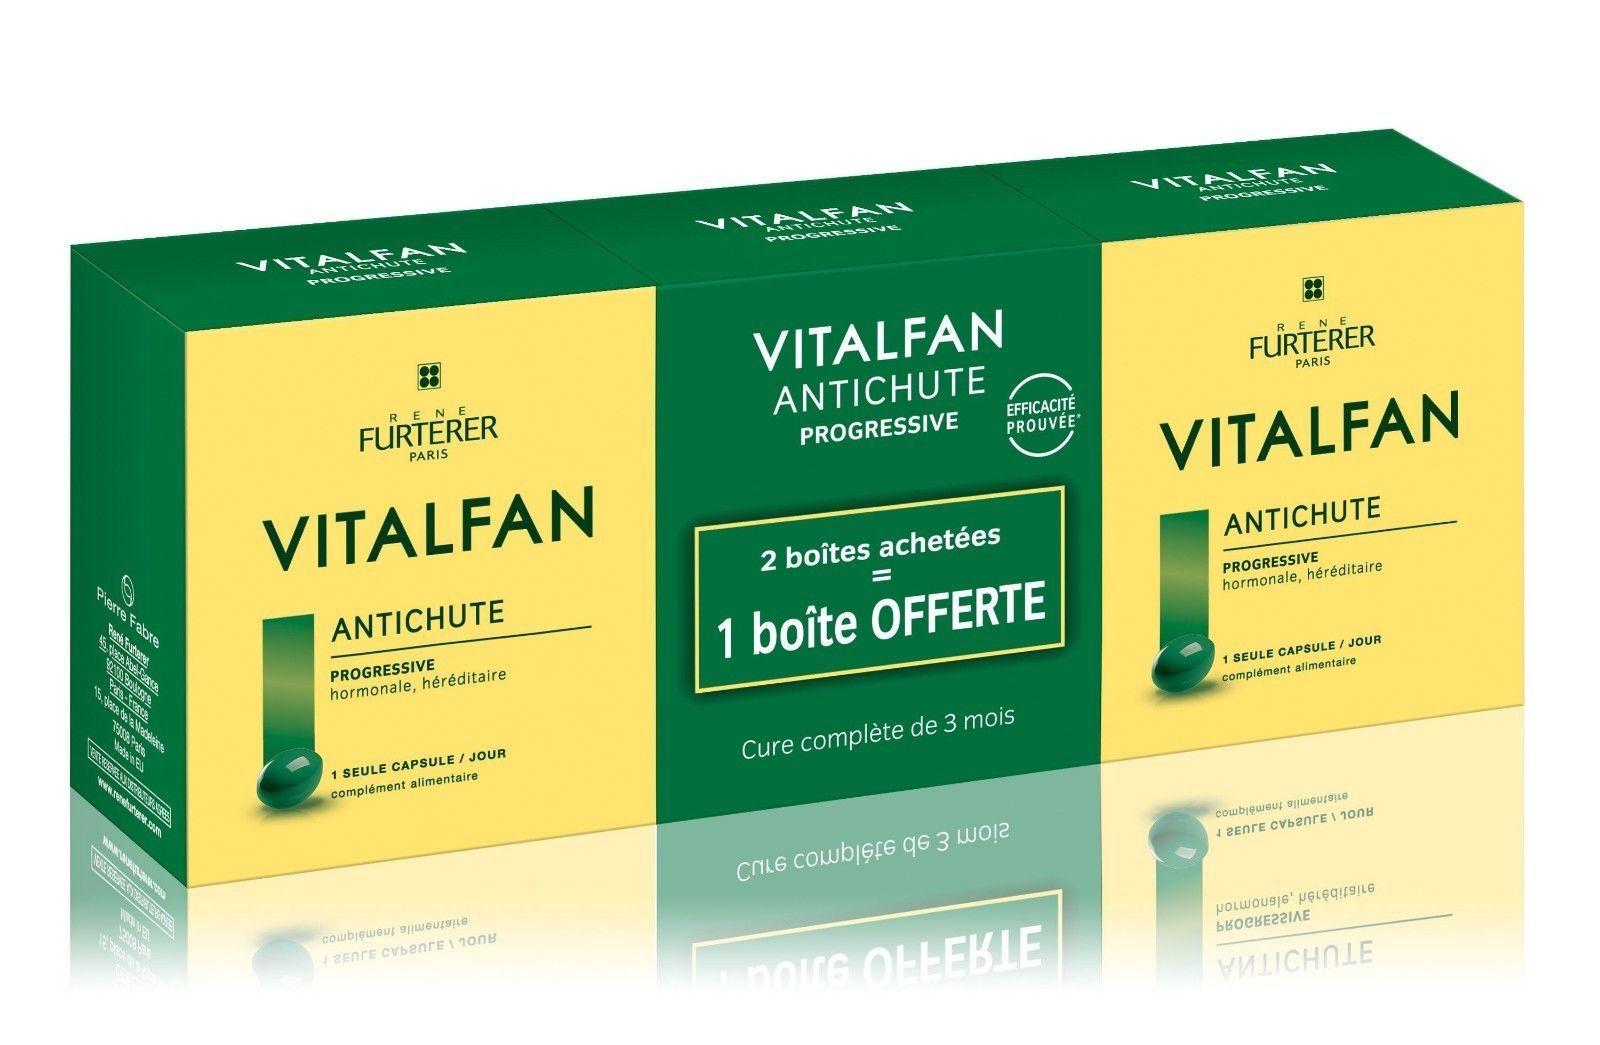 Genuine Rene Furterer Paris VITALFAN TRIO Chronic hair loss 30 capsules vitamin - $90.50